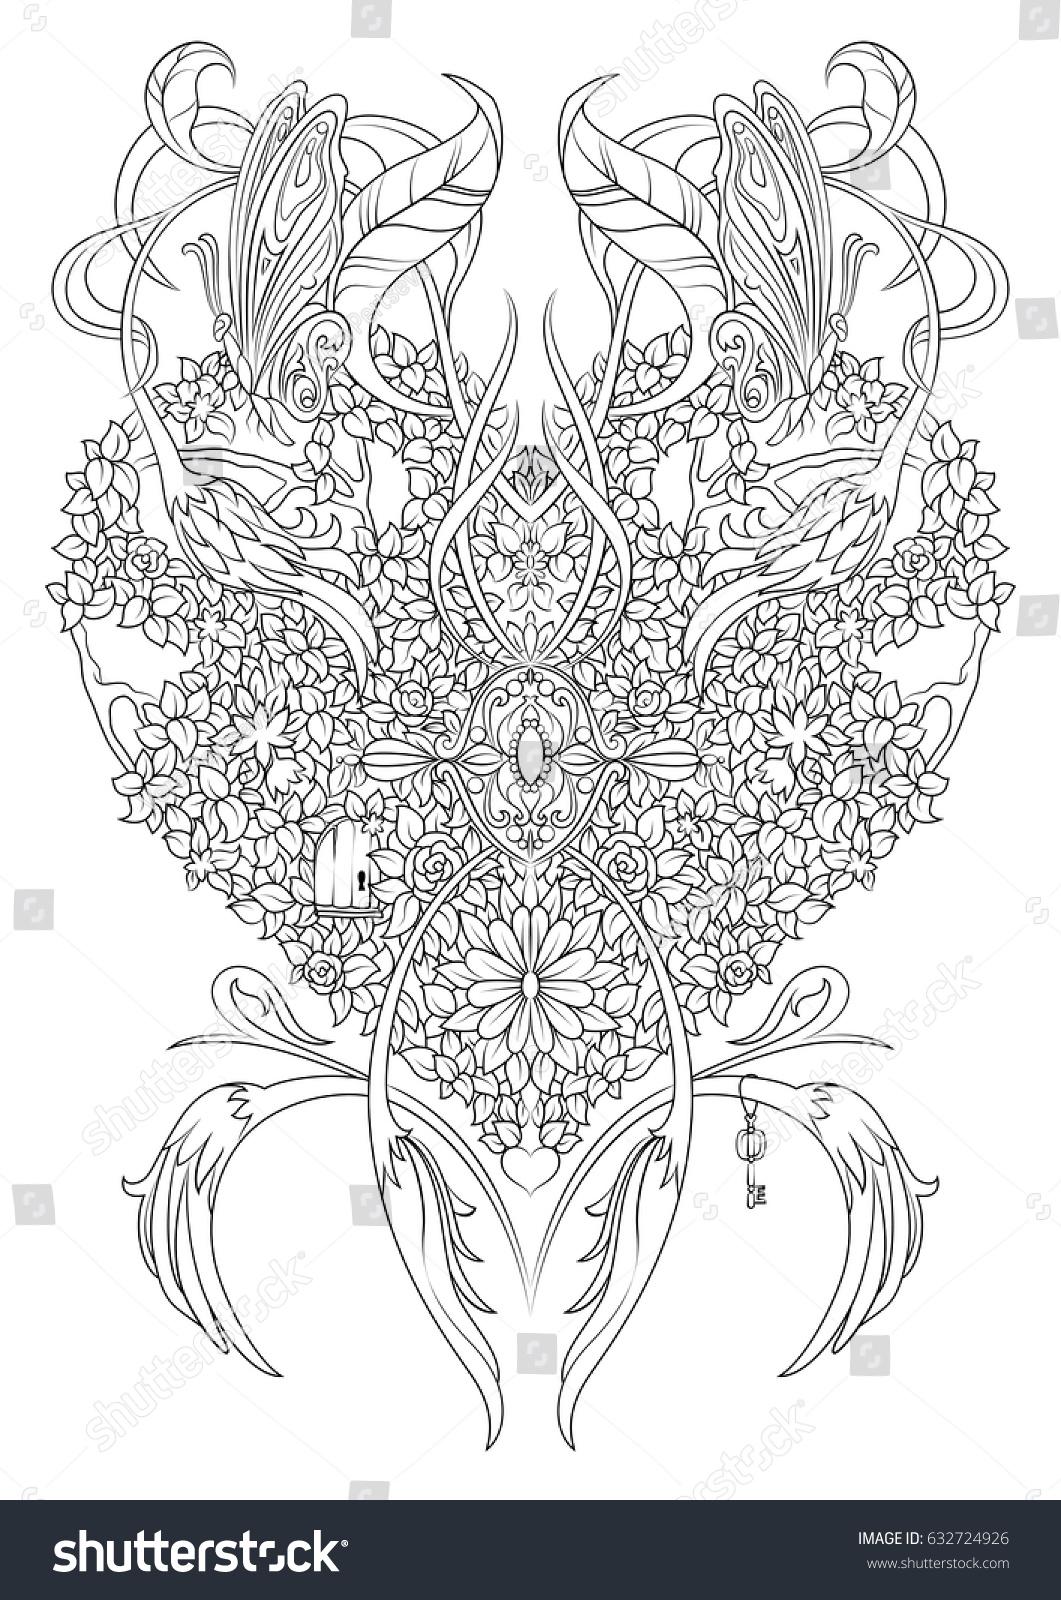 coloring page fantasy heart made shrubs stock vector 632724926